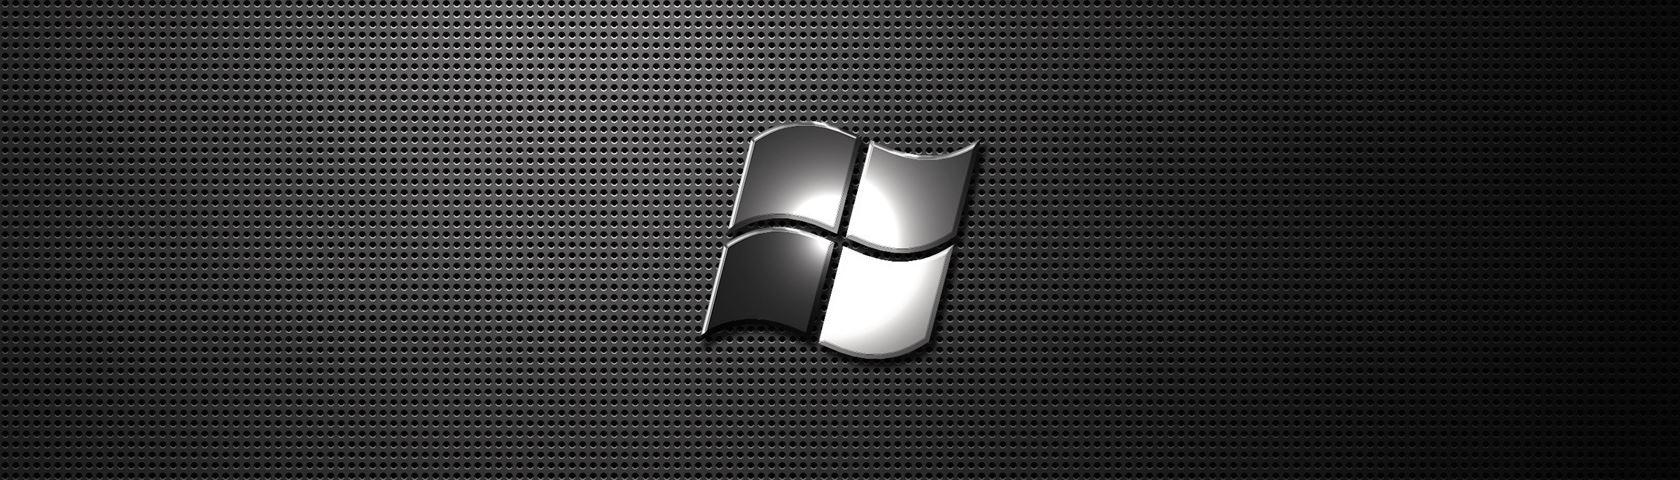 Metallic Windows